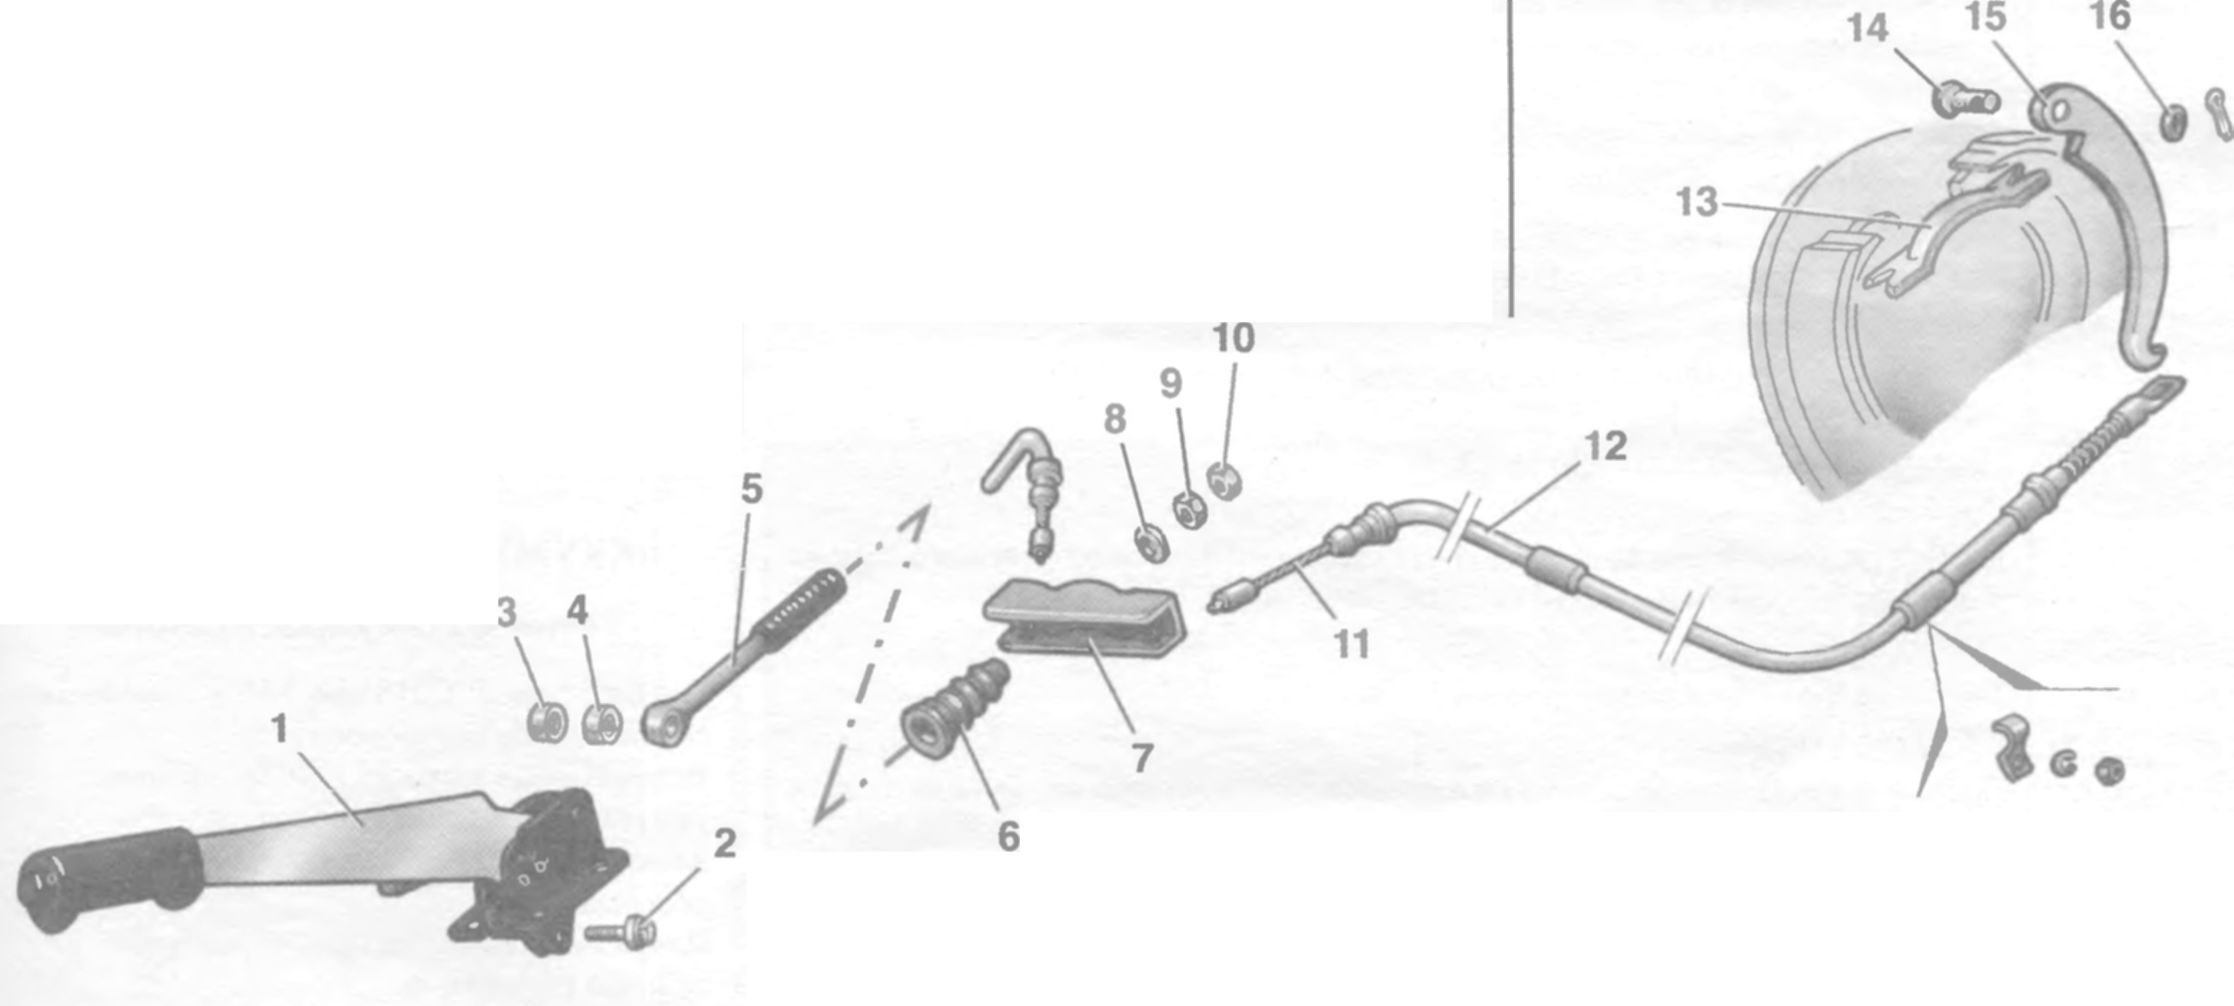 Фото №14 - ВАЗ 2110 тормозная система неисправности